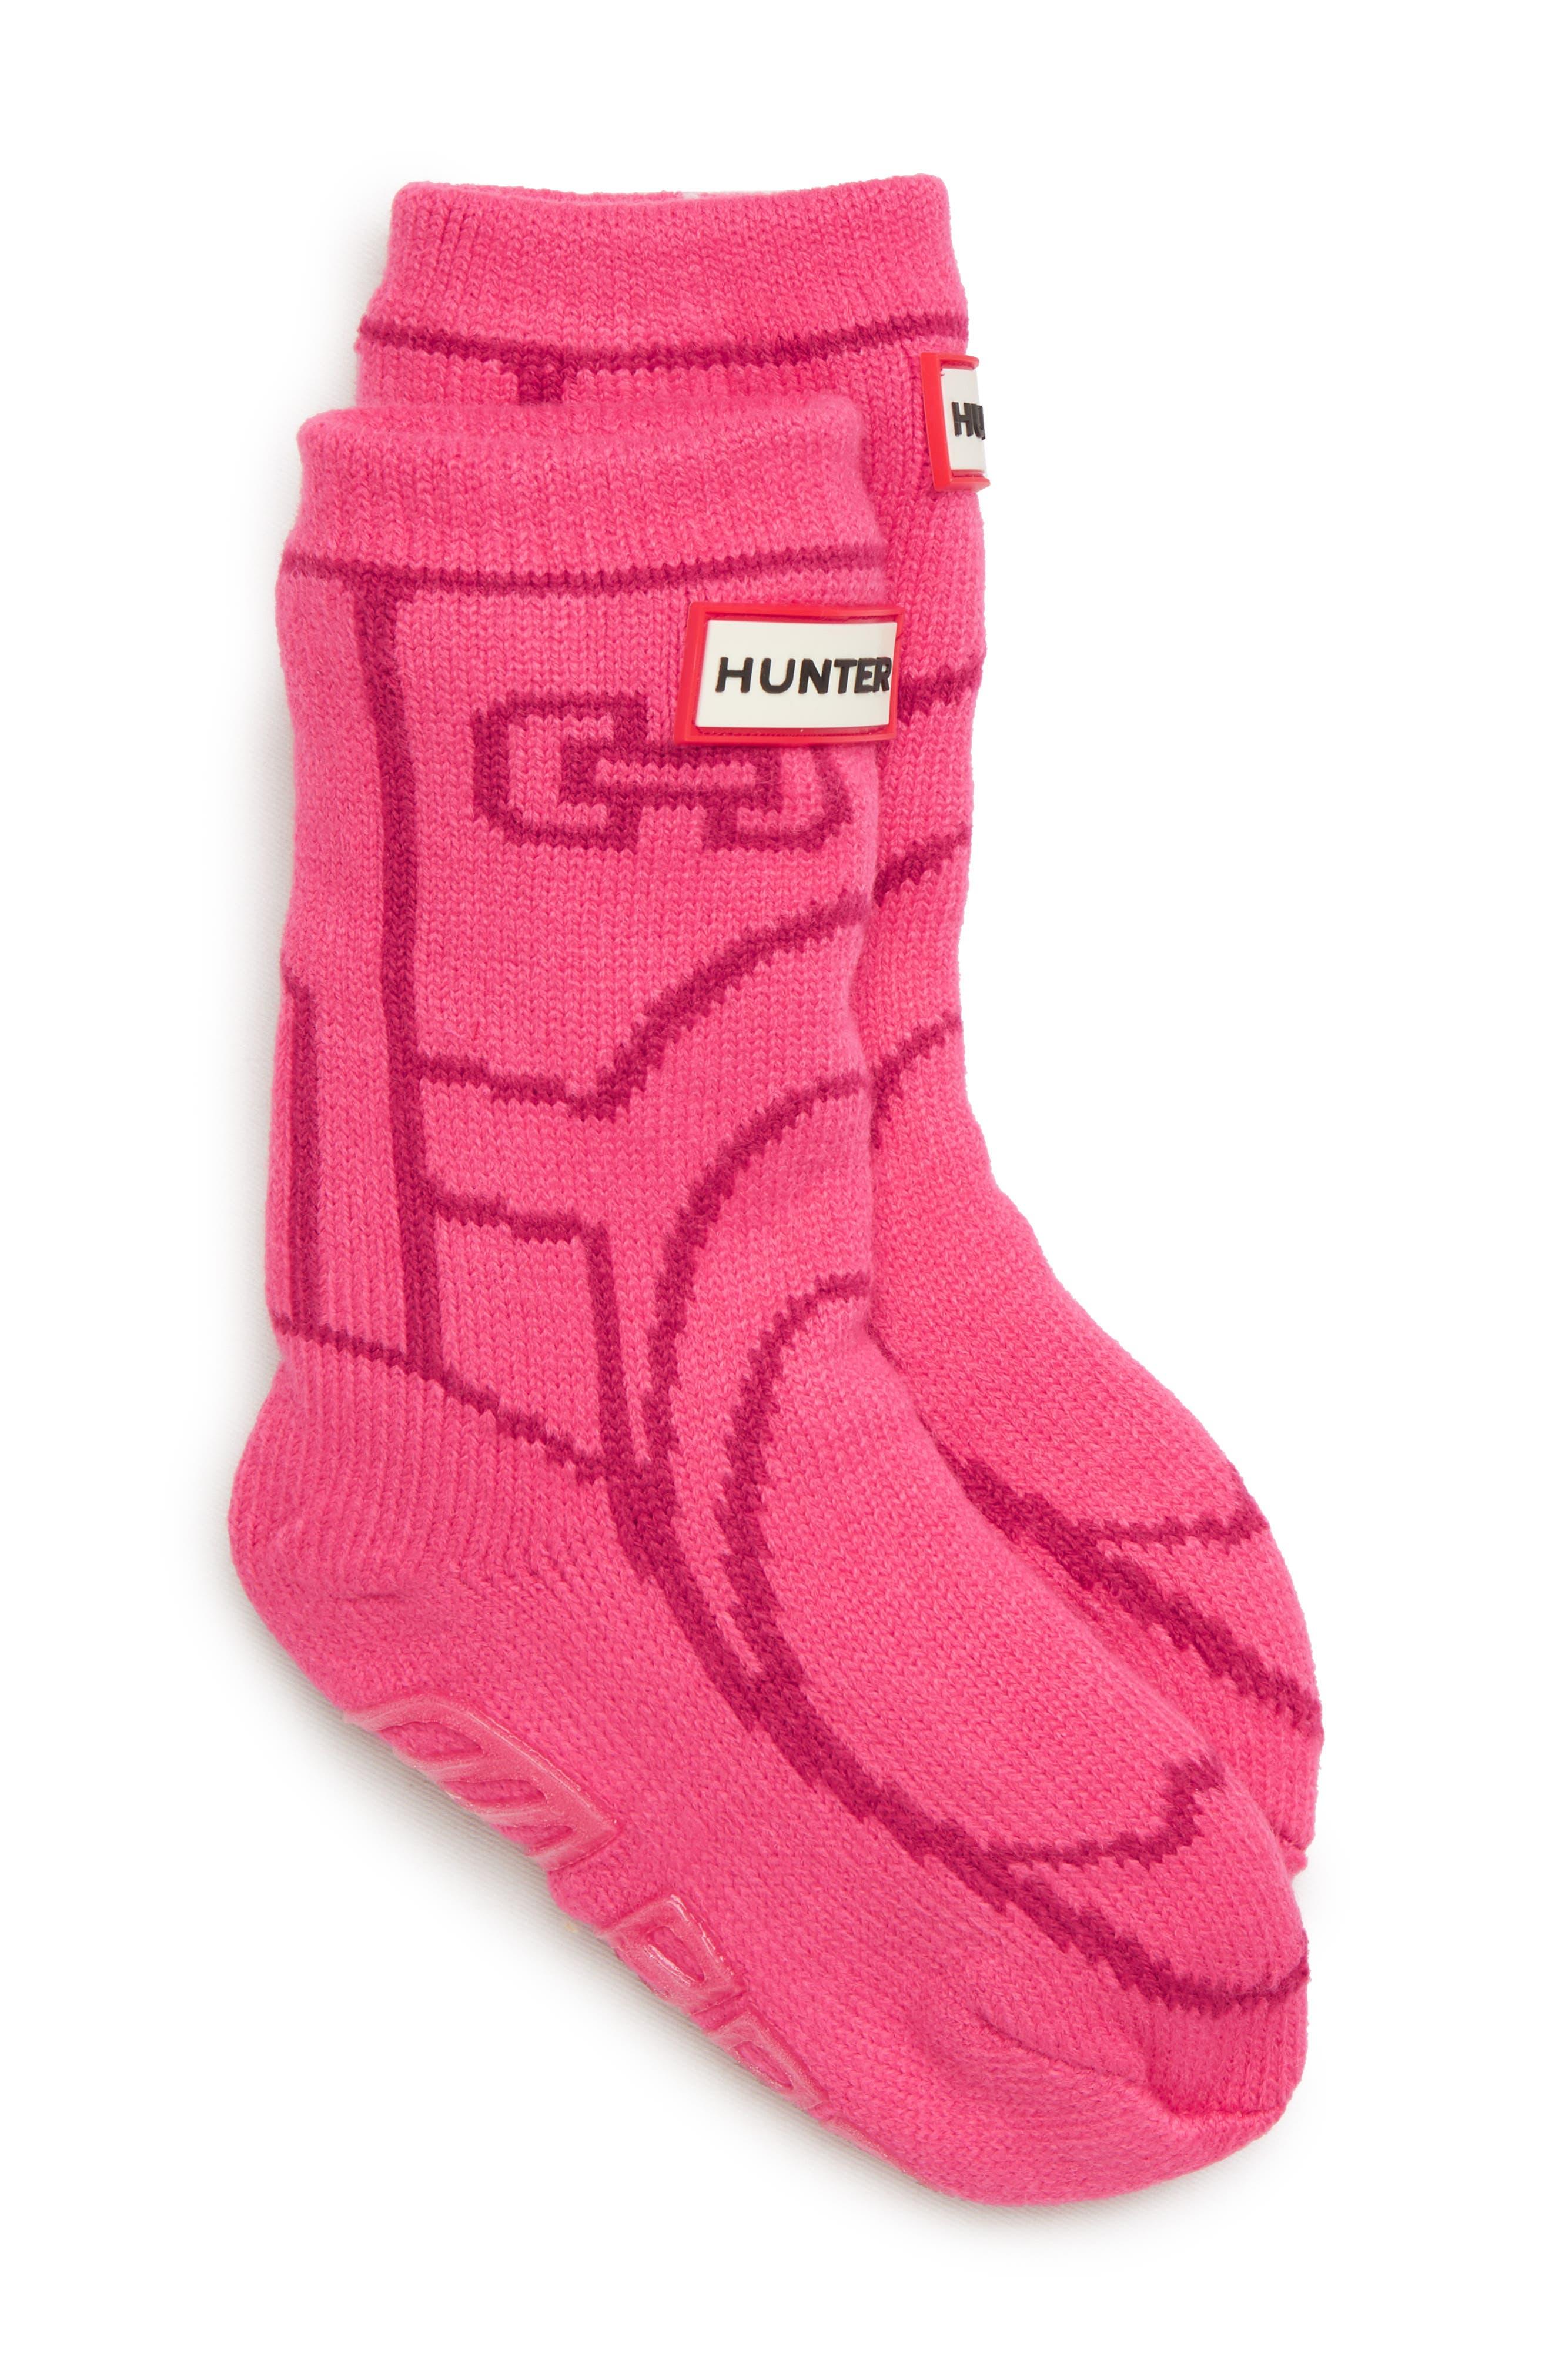 Toddler Hunter Original Boot Slipper Socks Size Large  Pink